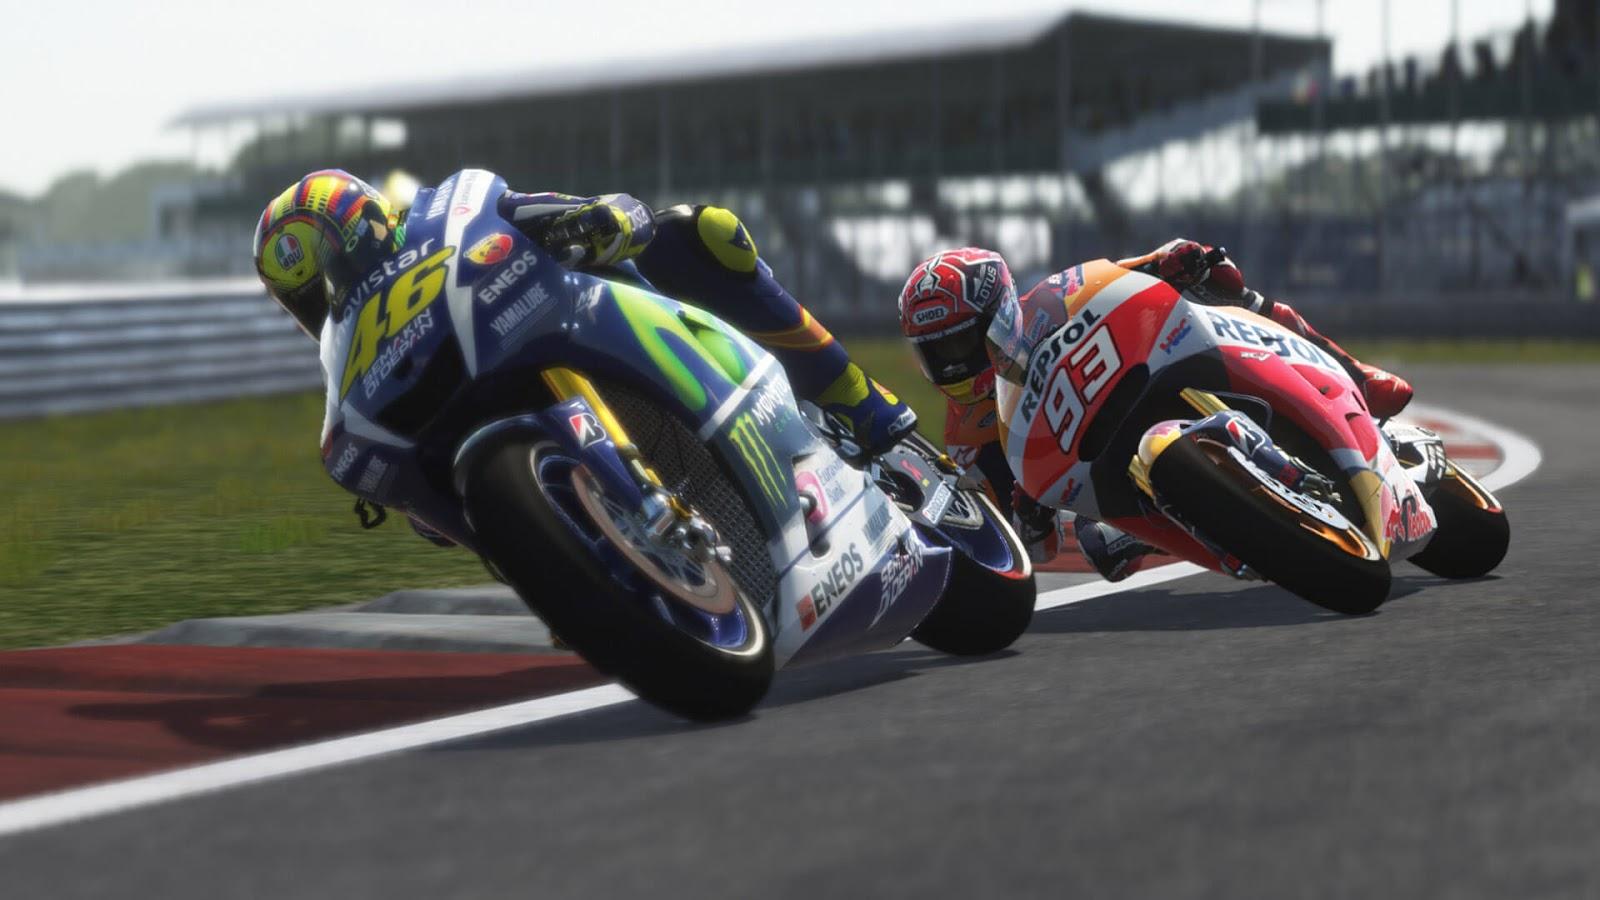 MotoGP 18 iOS/APK Version Full Game Free Download